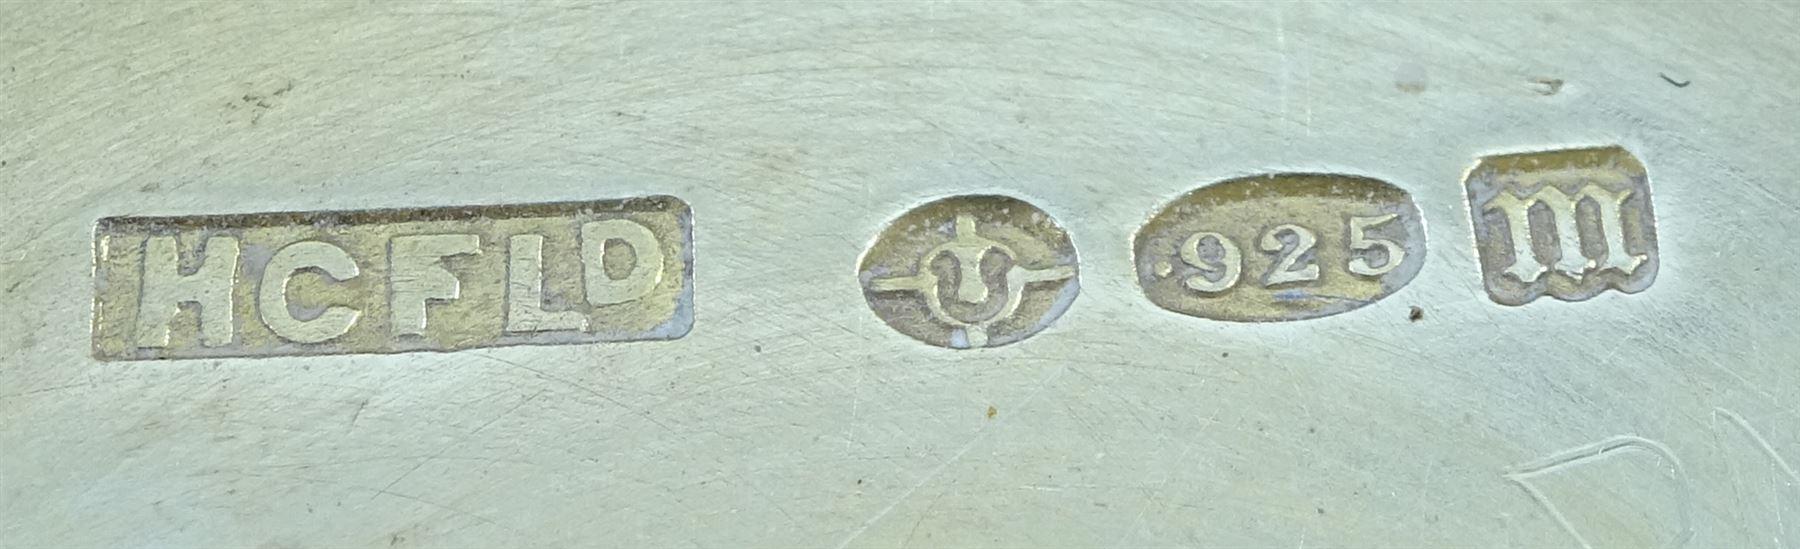 Silver enamel circular compact - Image 2 of 4